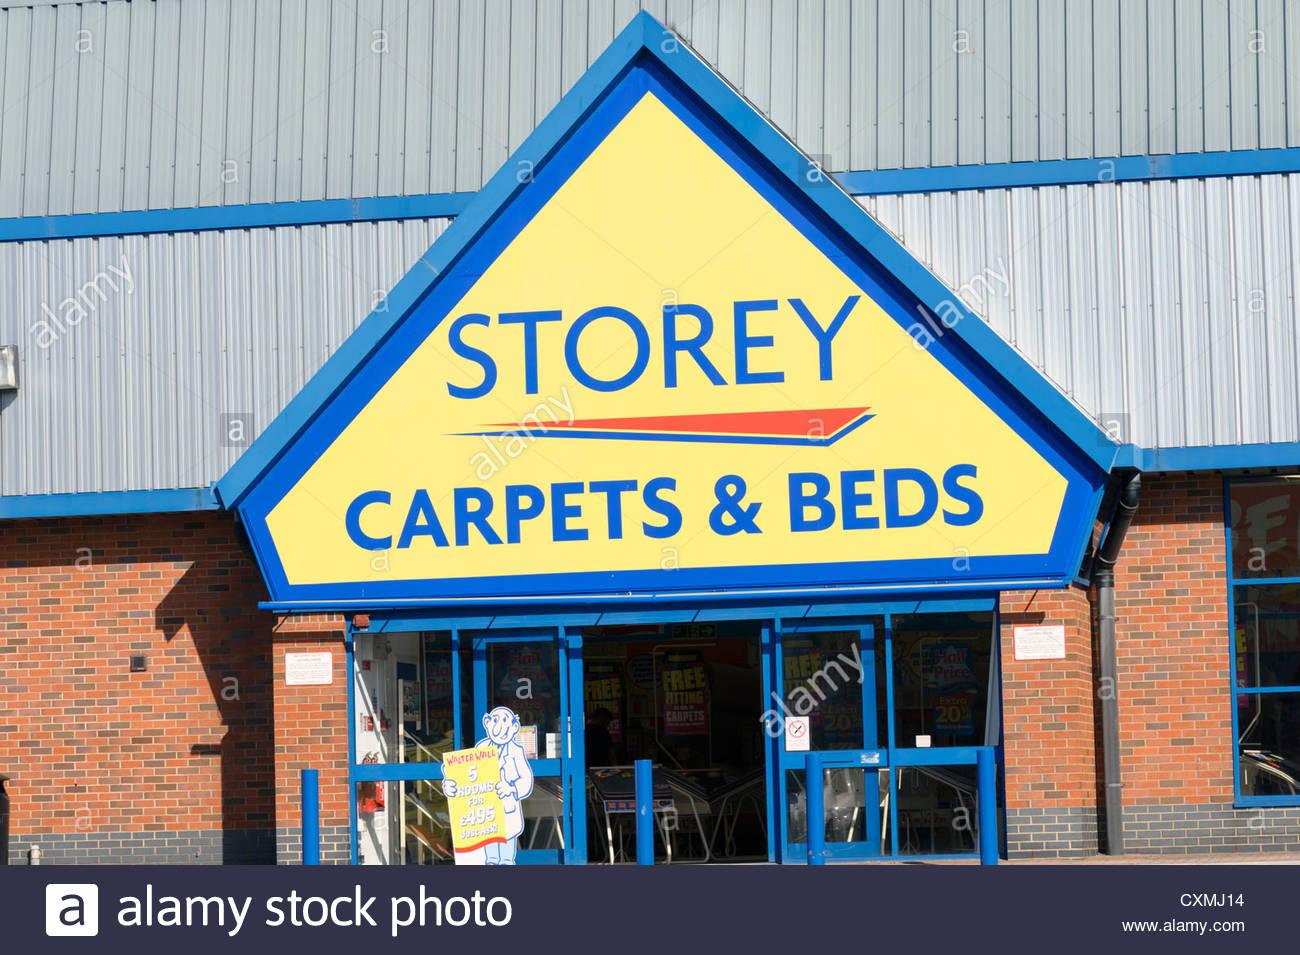 Storey carpets & beds store in Cheltenham, UK. - Stock Image